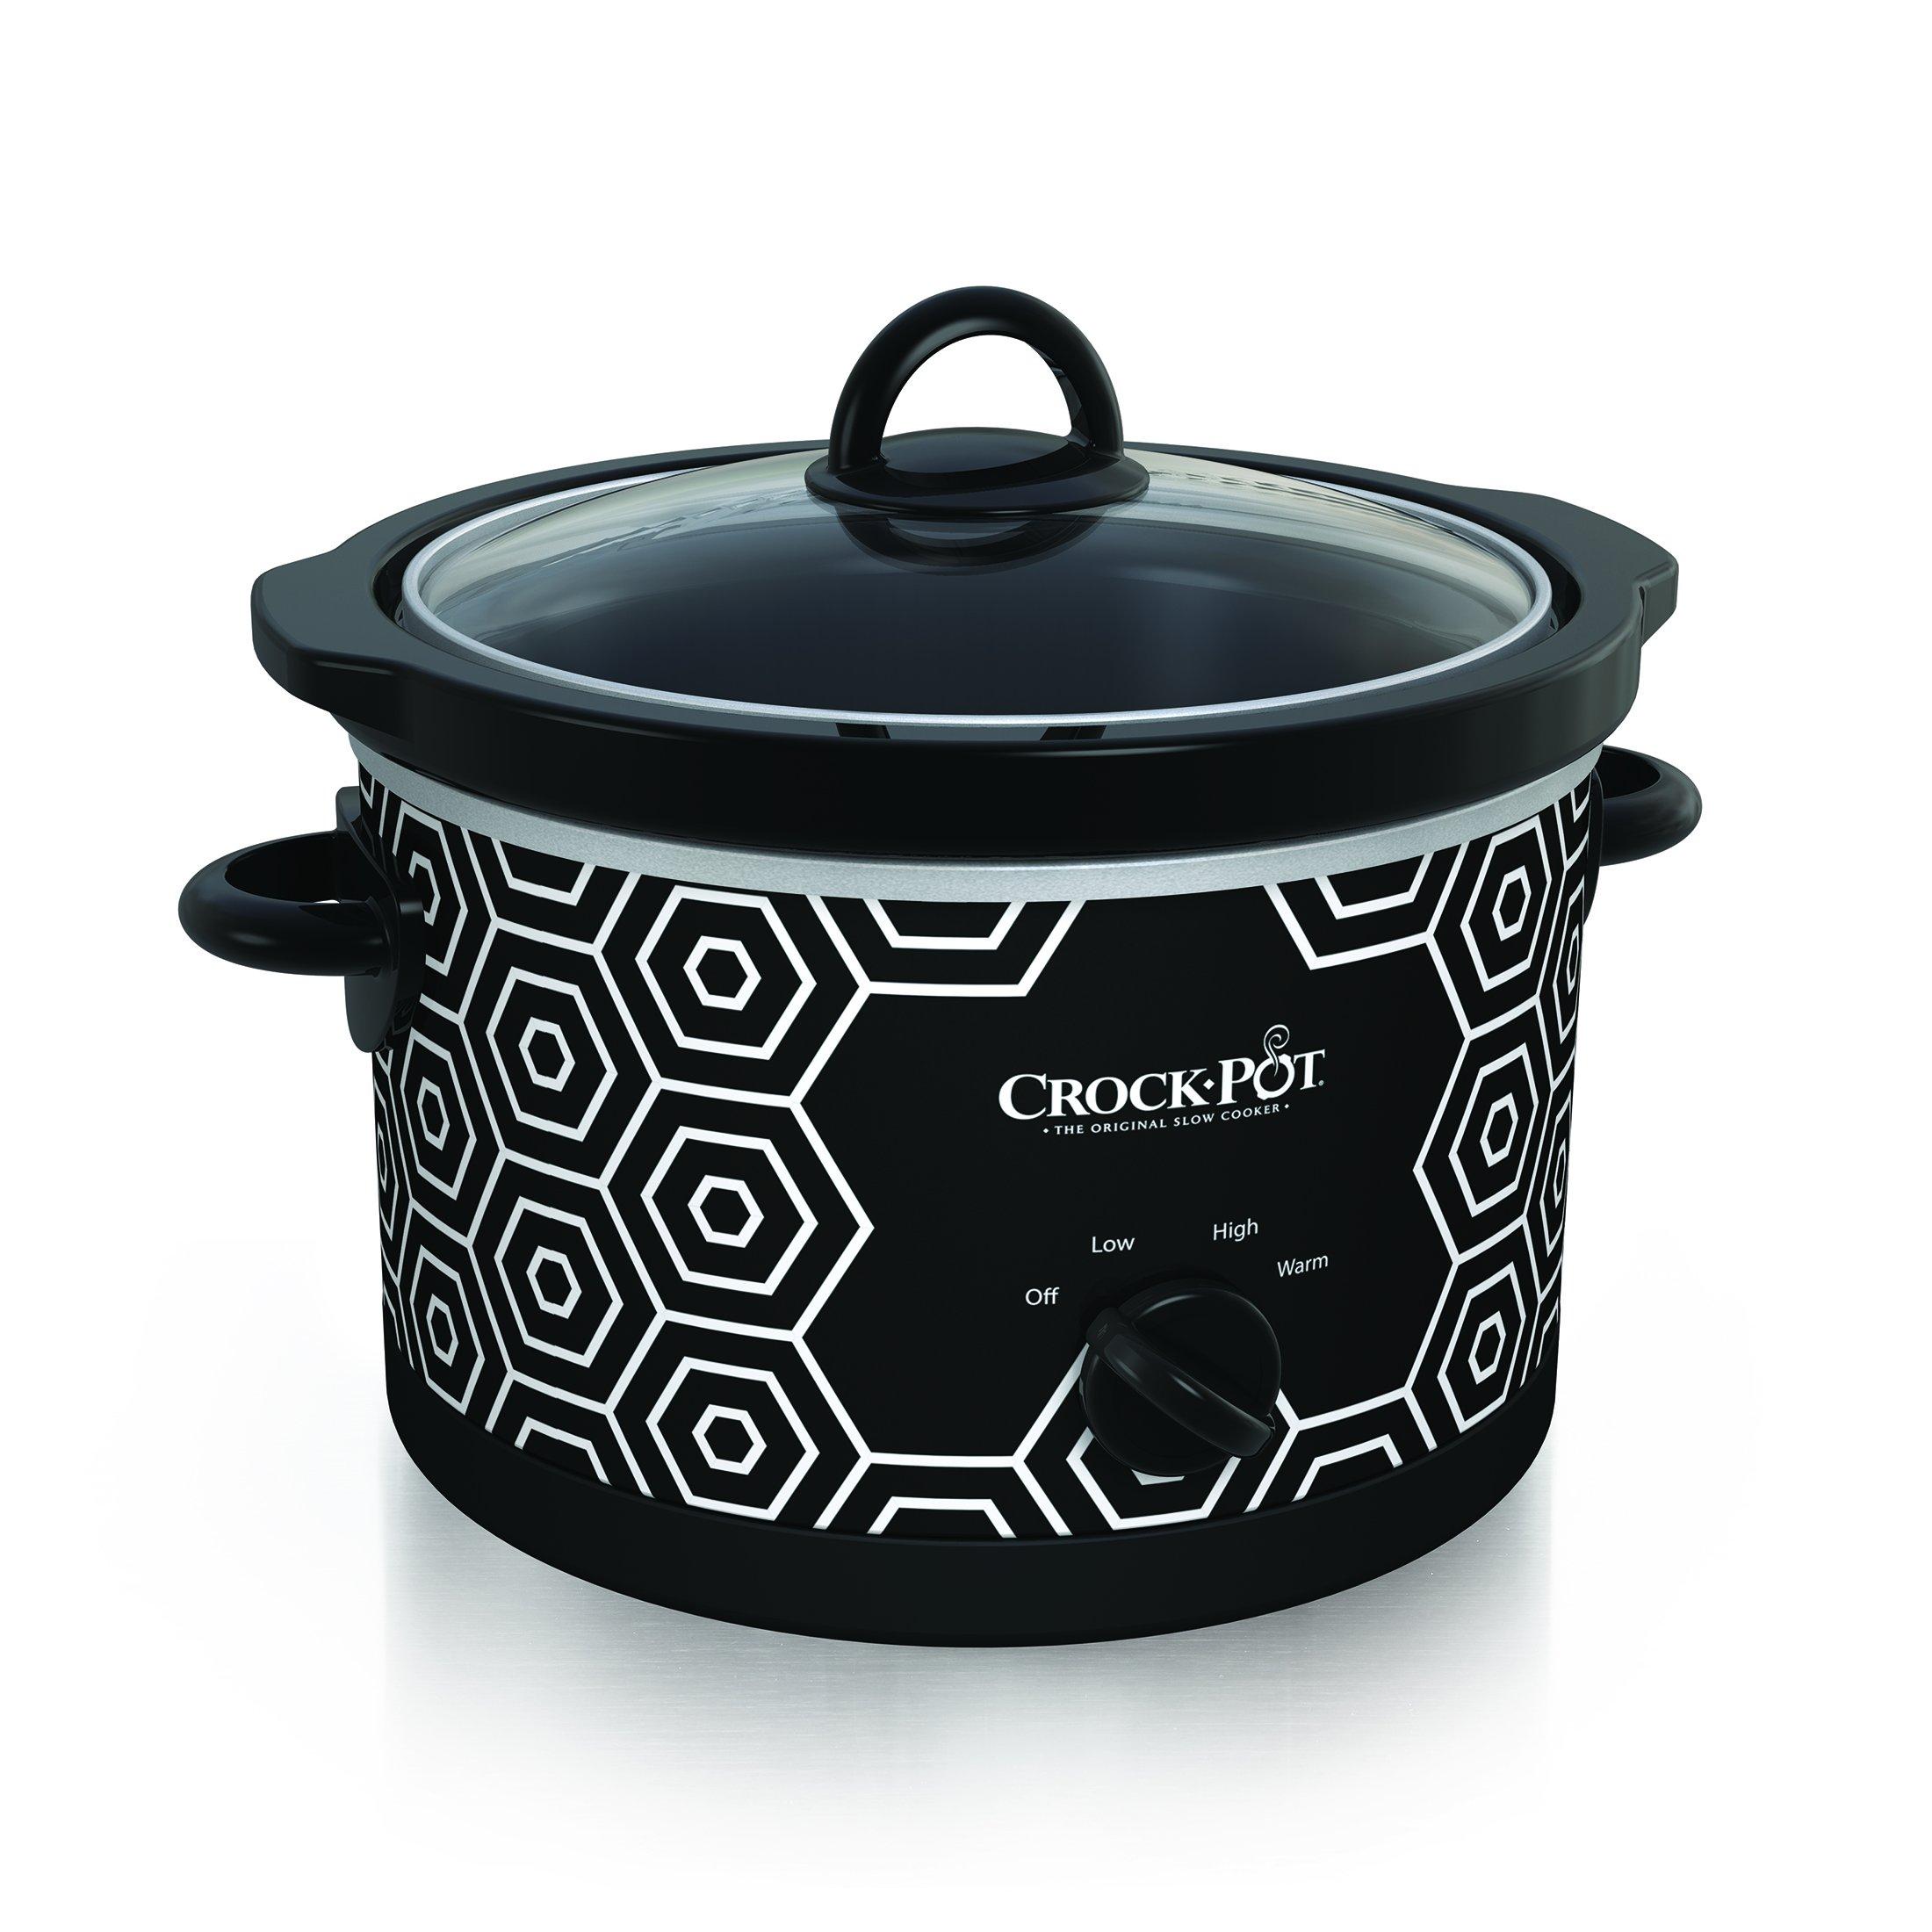 Crockpot Round Slow Cooker, 4.5 quart, Black & White Pattern (SCR450-HX)